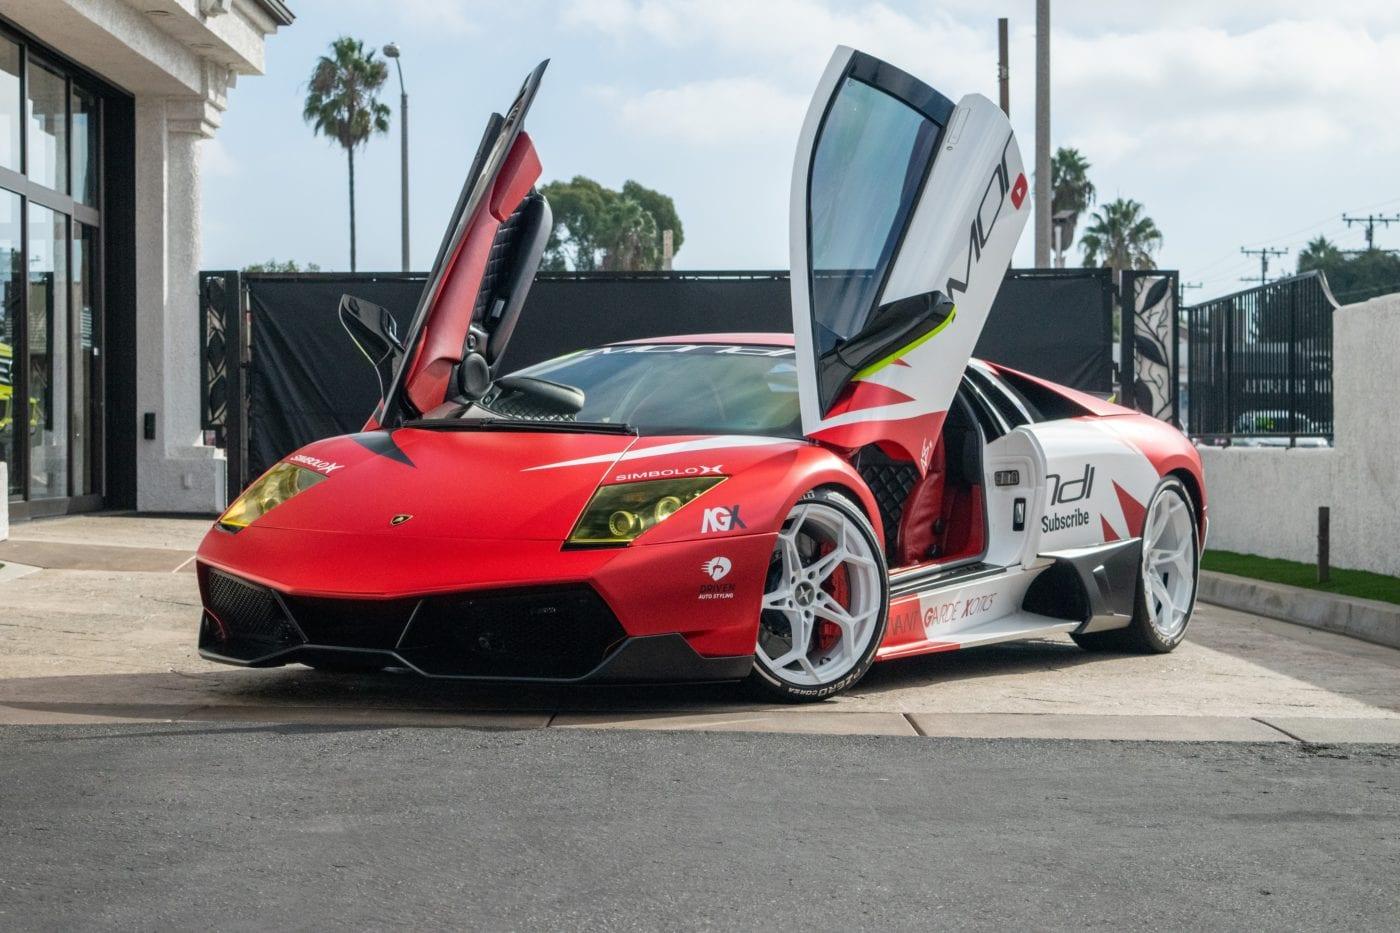 Buy YouTube Star Edmond Mondi's Lamborghini Murcielago